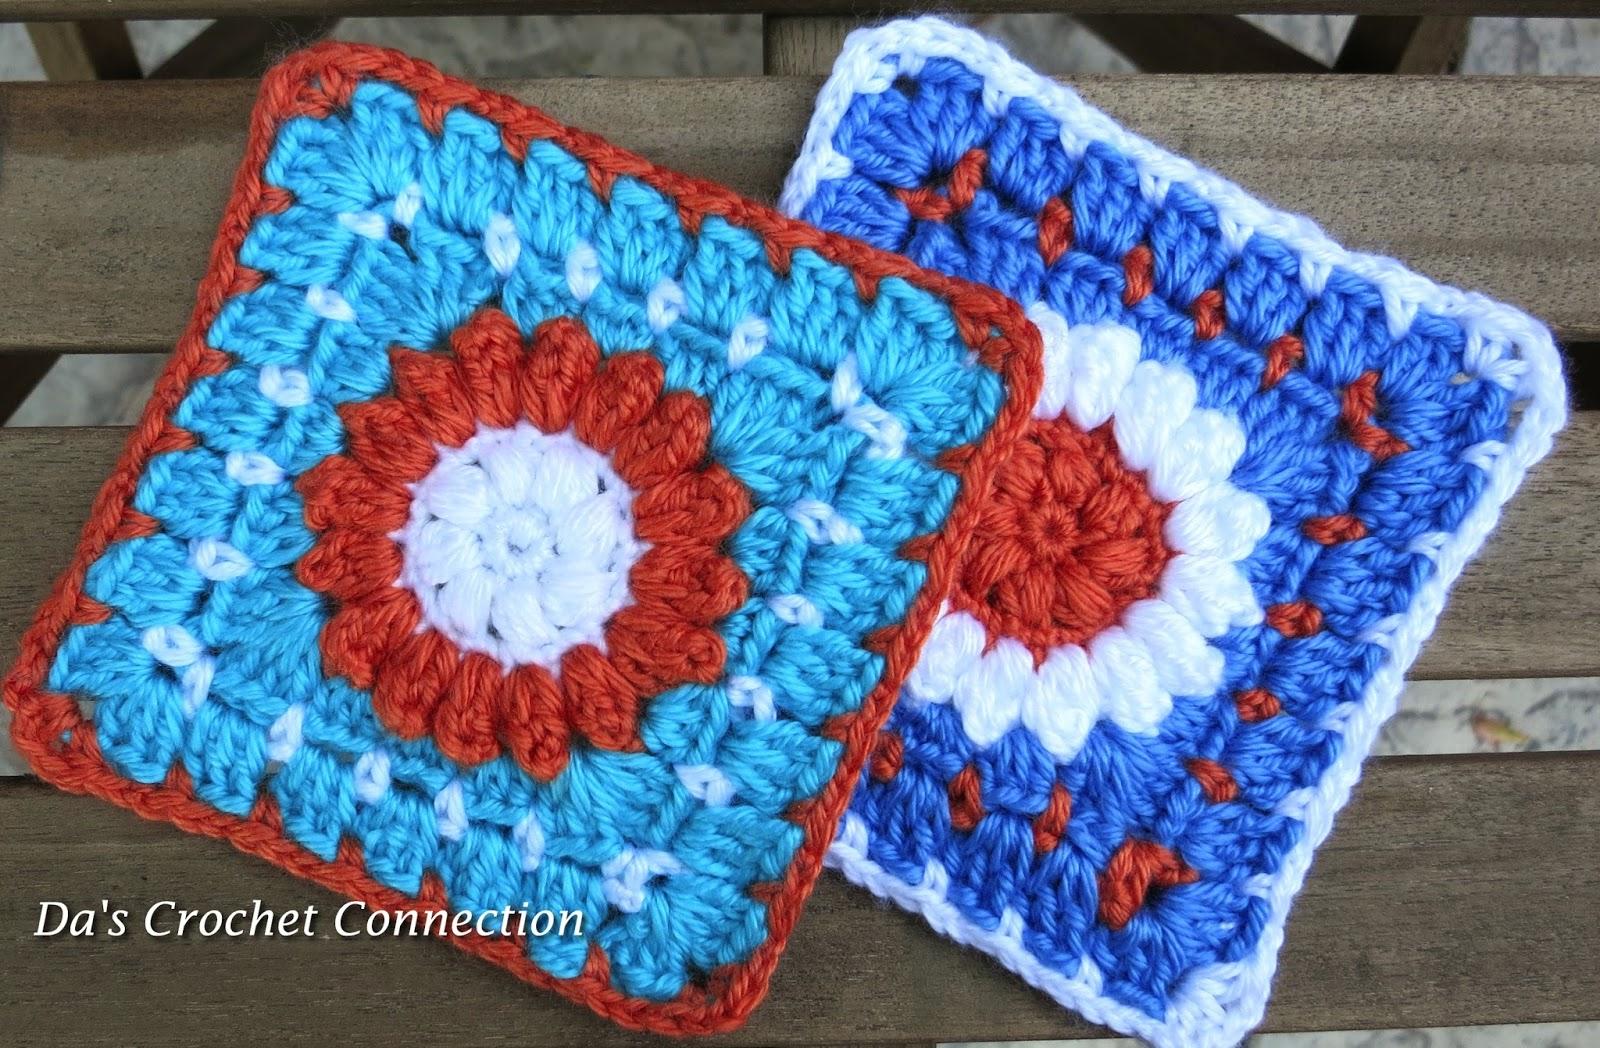 Da\'s Crochet Connection: Mystery Lapghan Crochet-A-long Square